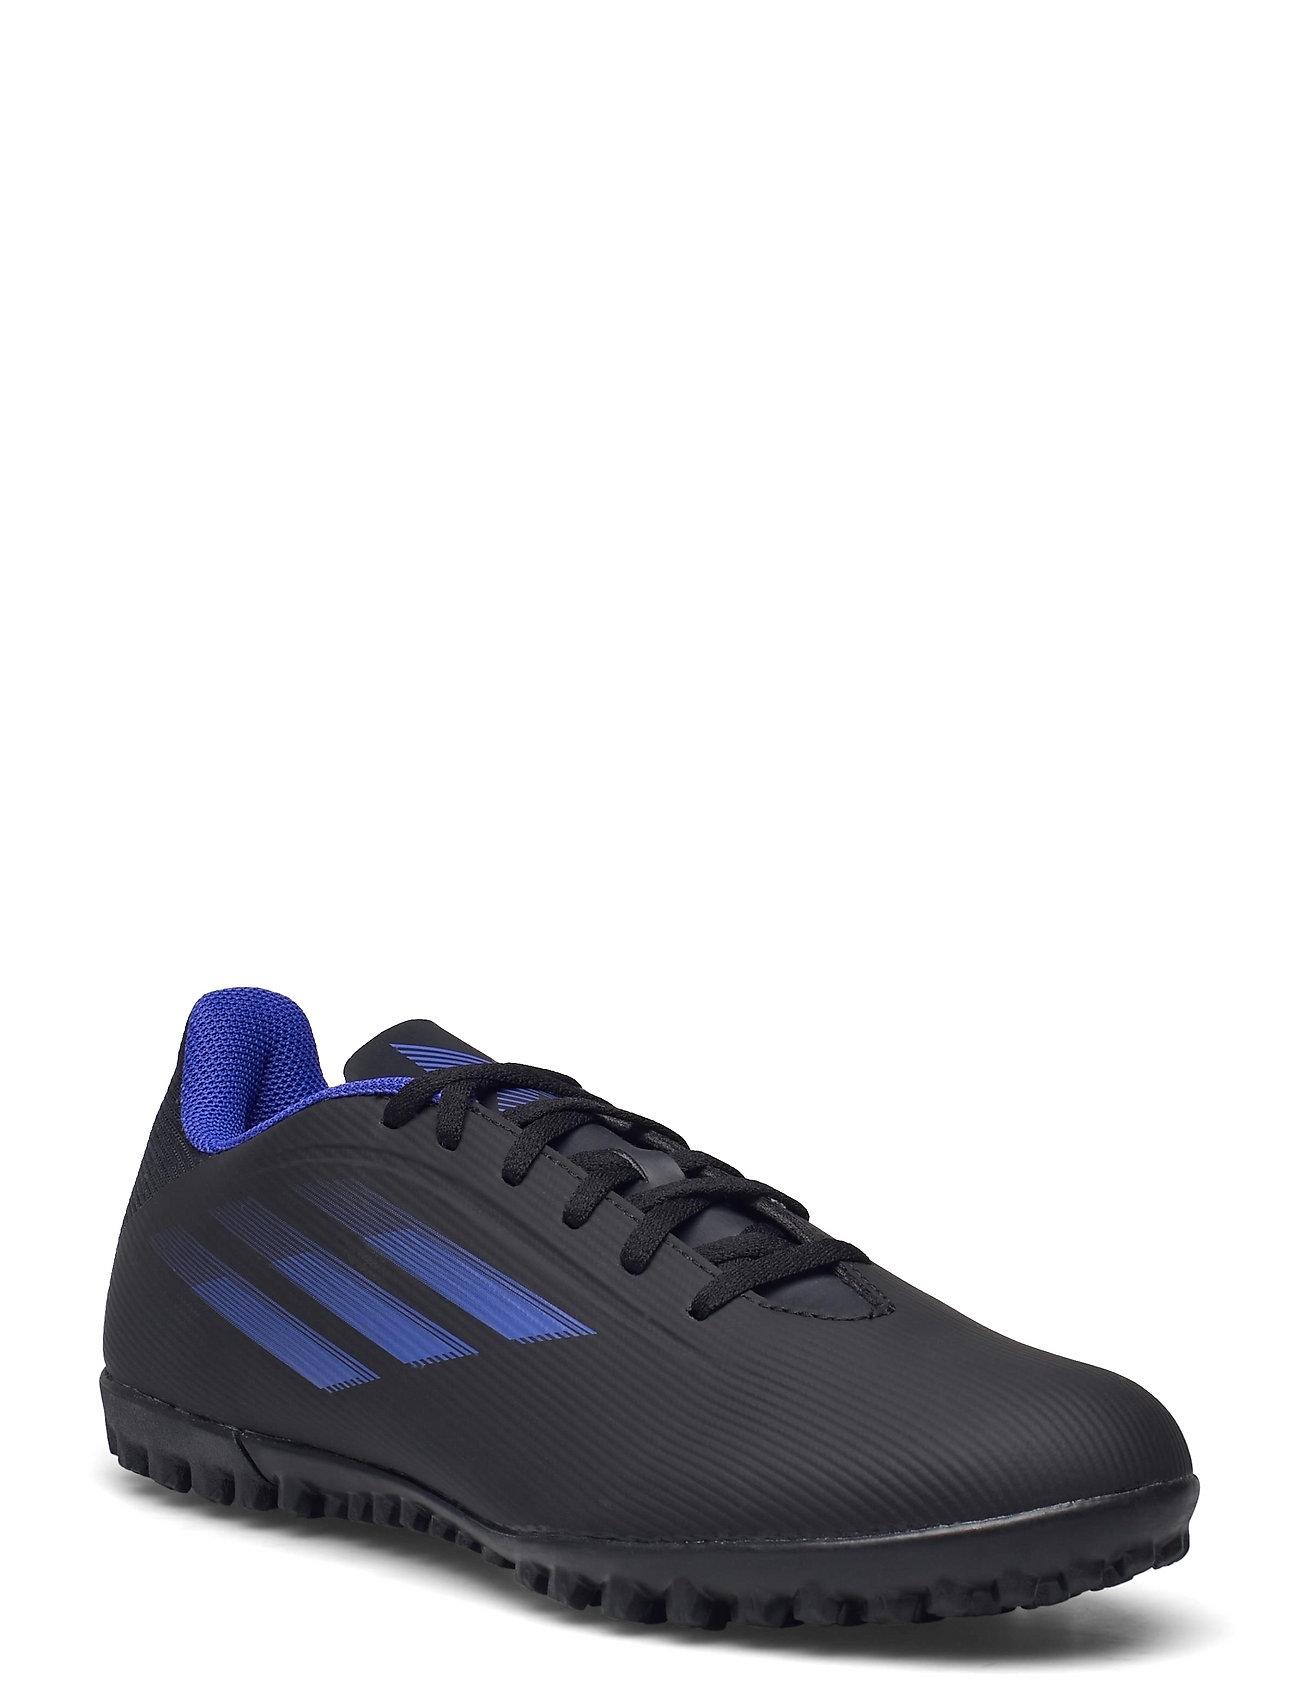 X Speedflow.4 Turf Boots Q3q4 21 Shoes Sport Shoes Football Boots Sort Adidas Performance